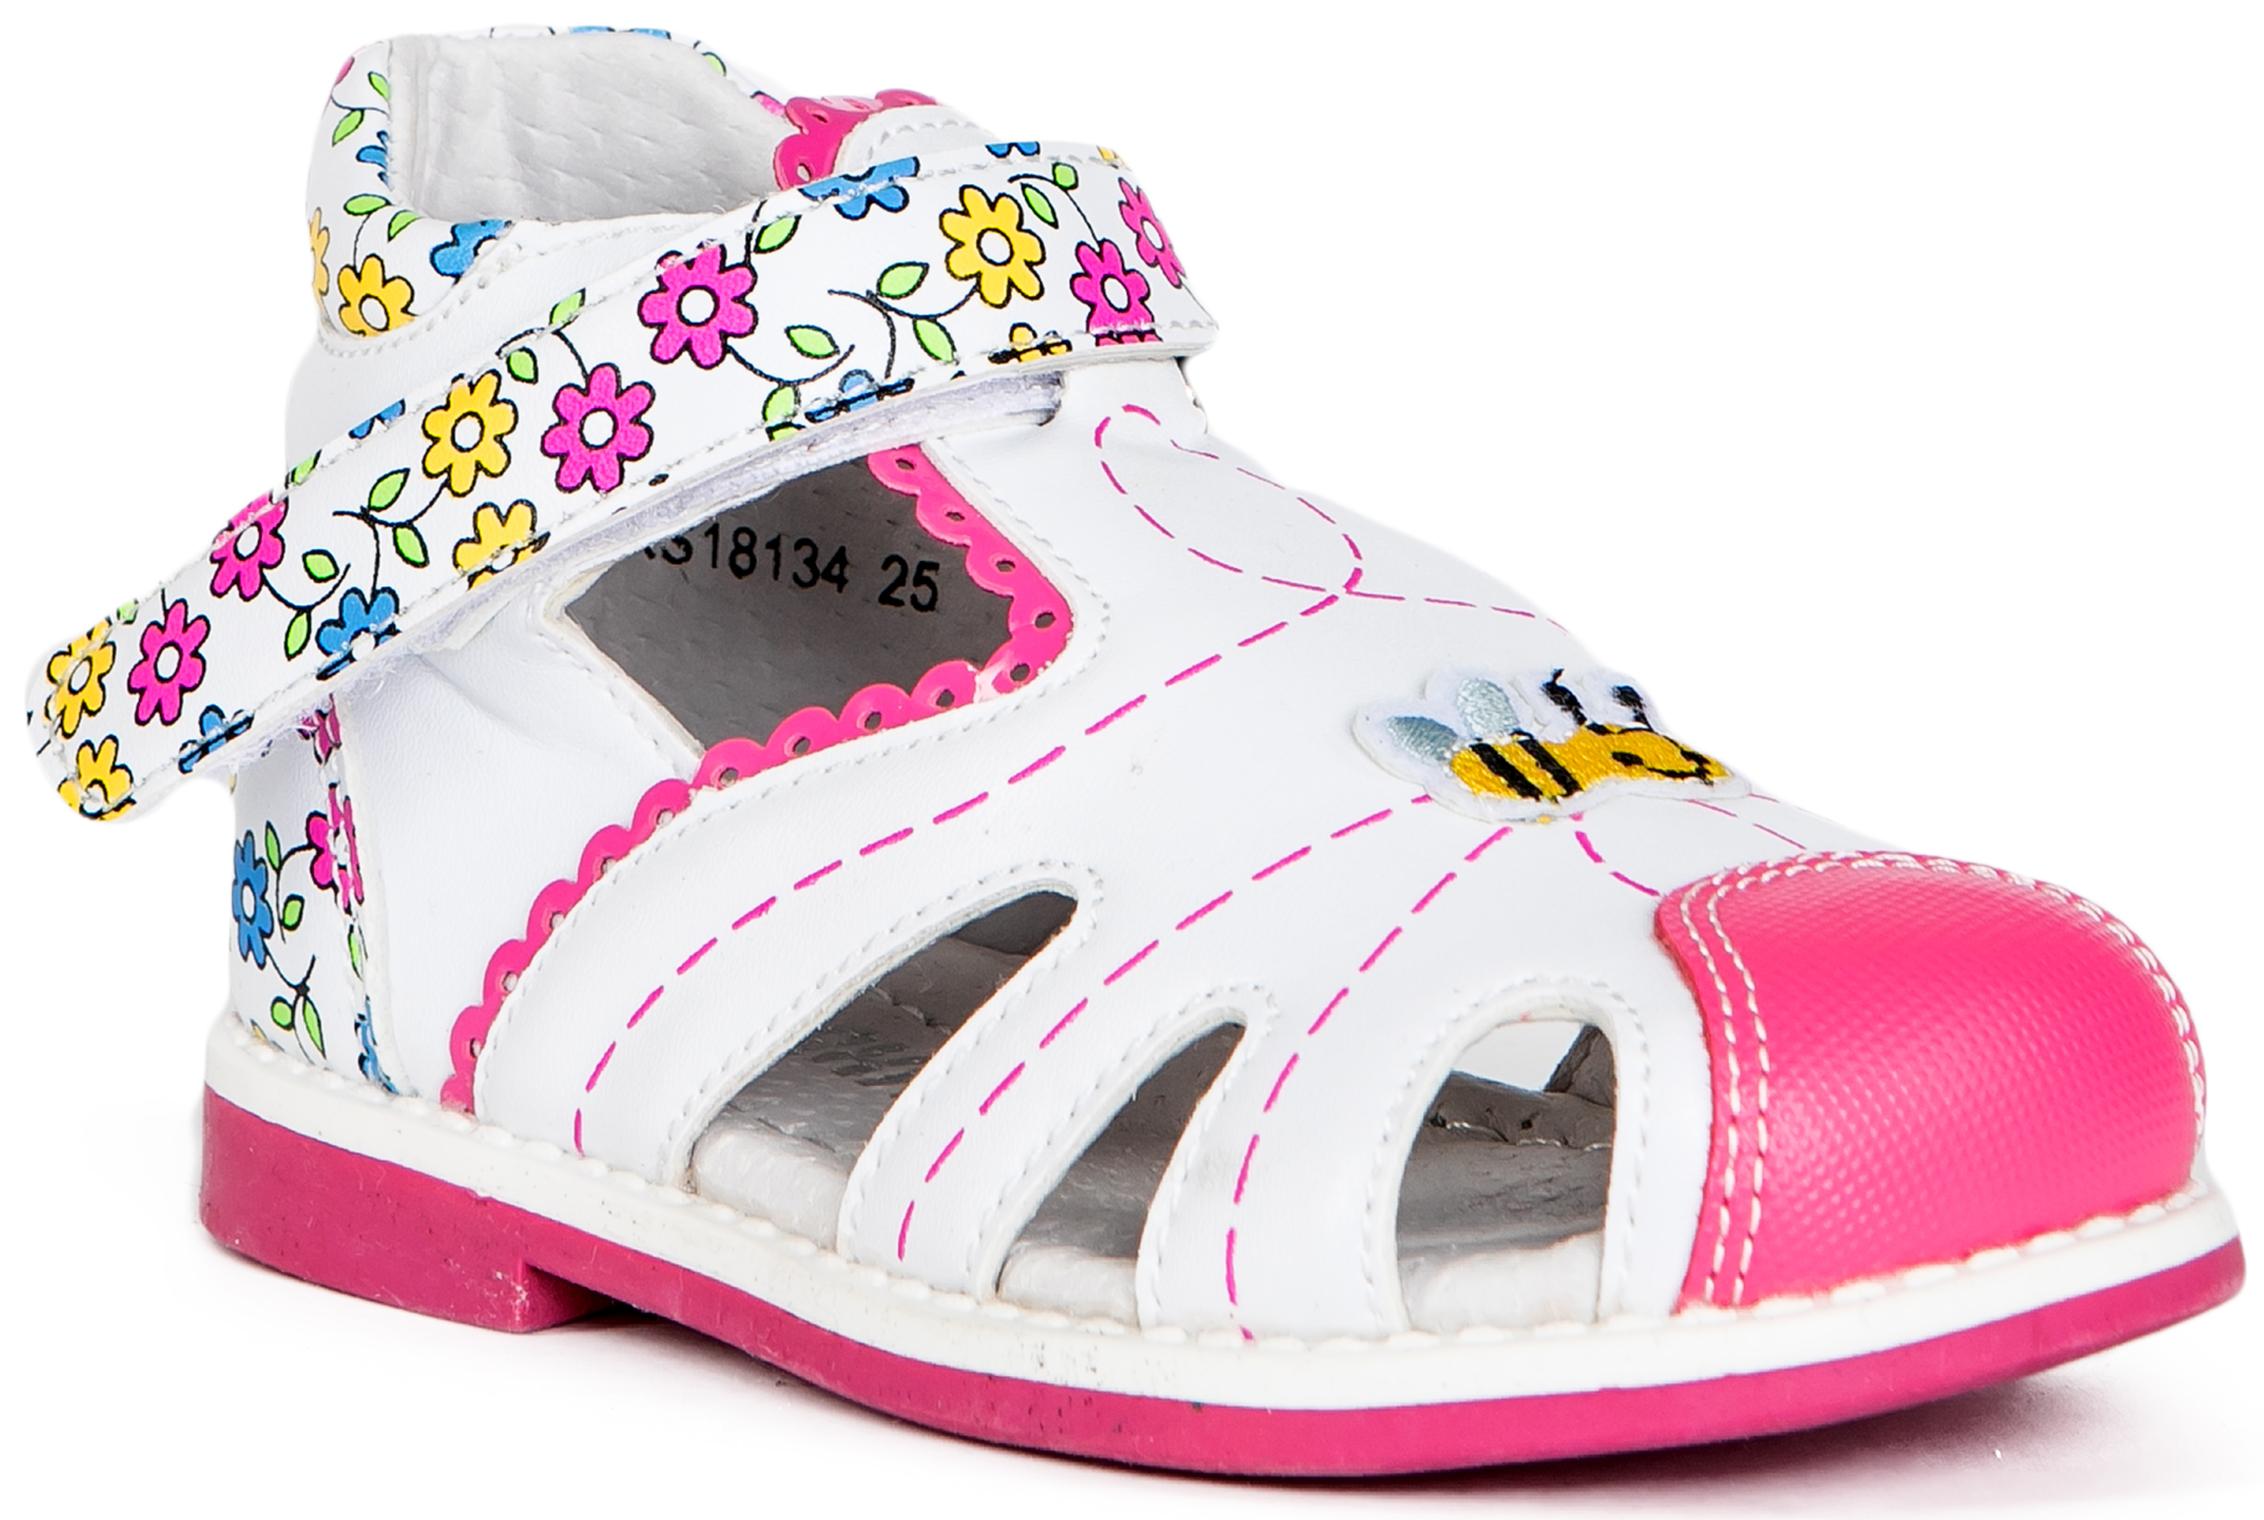 Cандалеты Barkito KRS18134 босоножки barkito сандалеты для девочки barkito фуксия